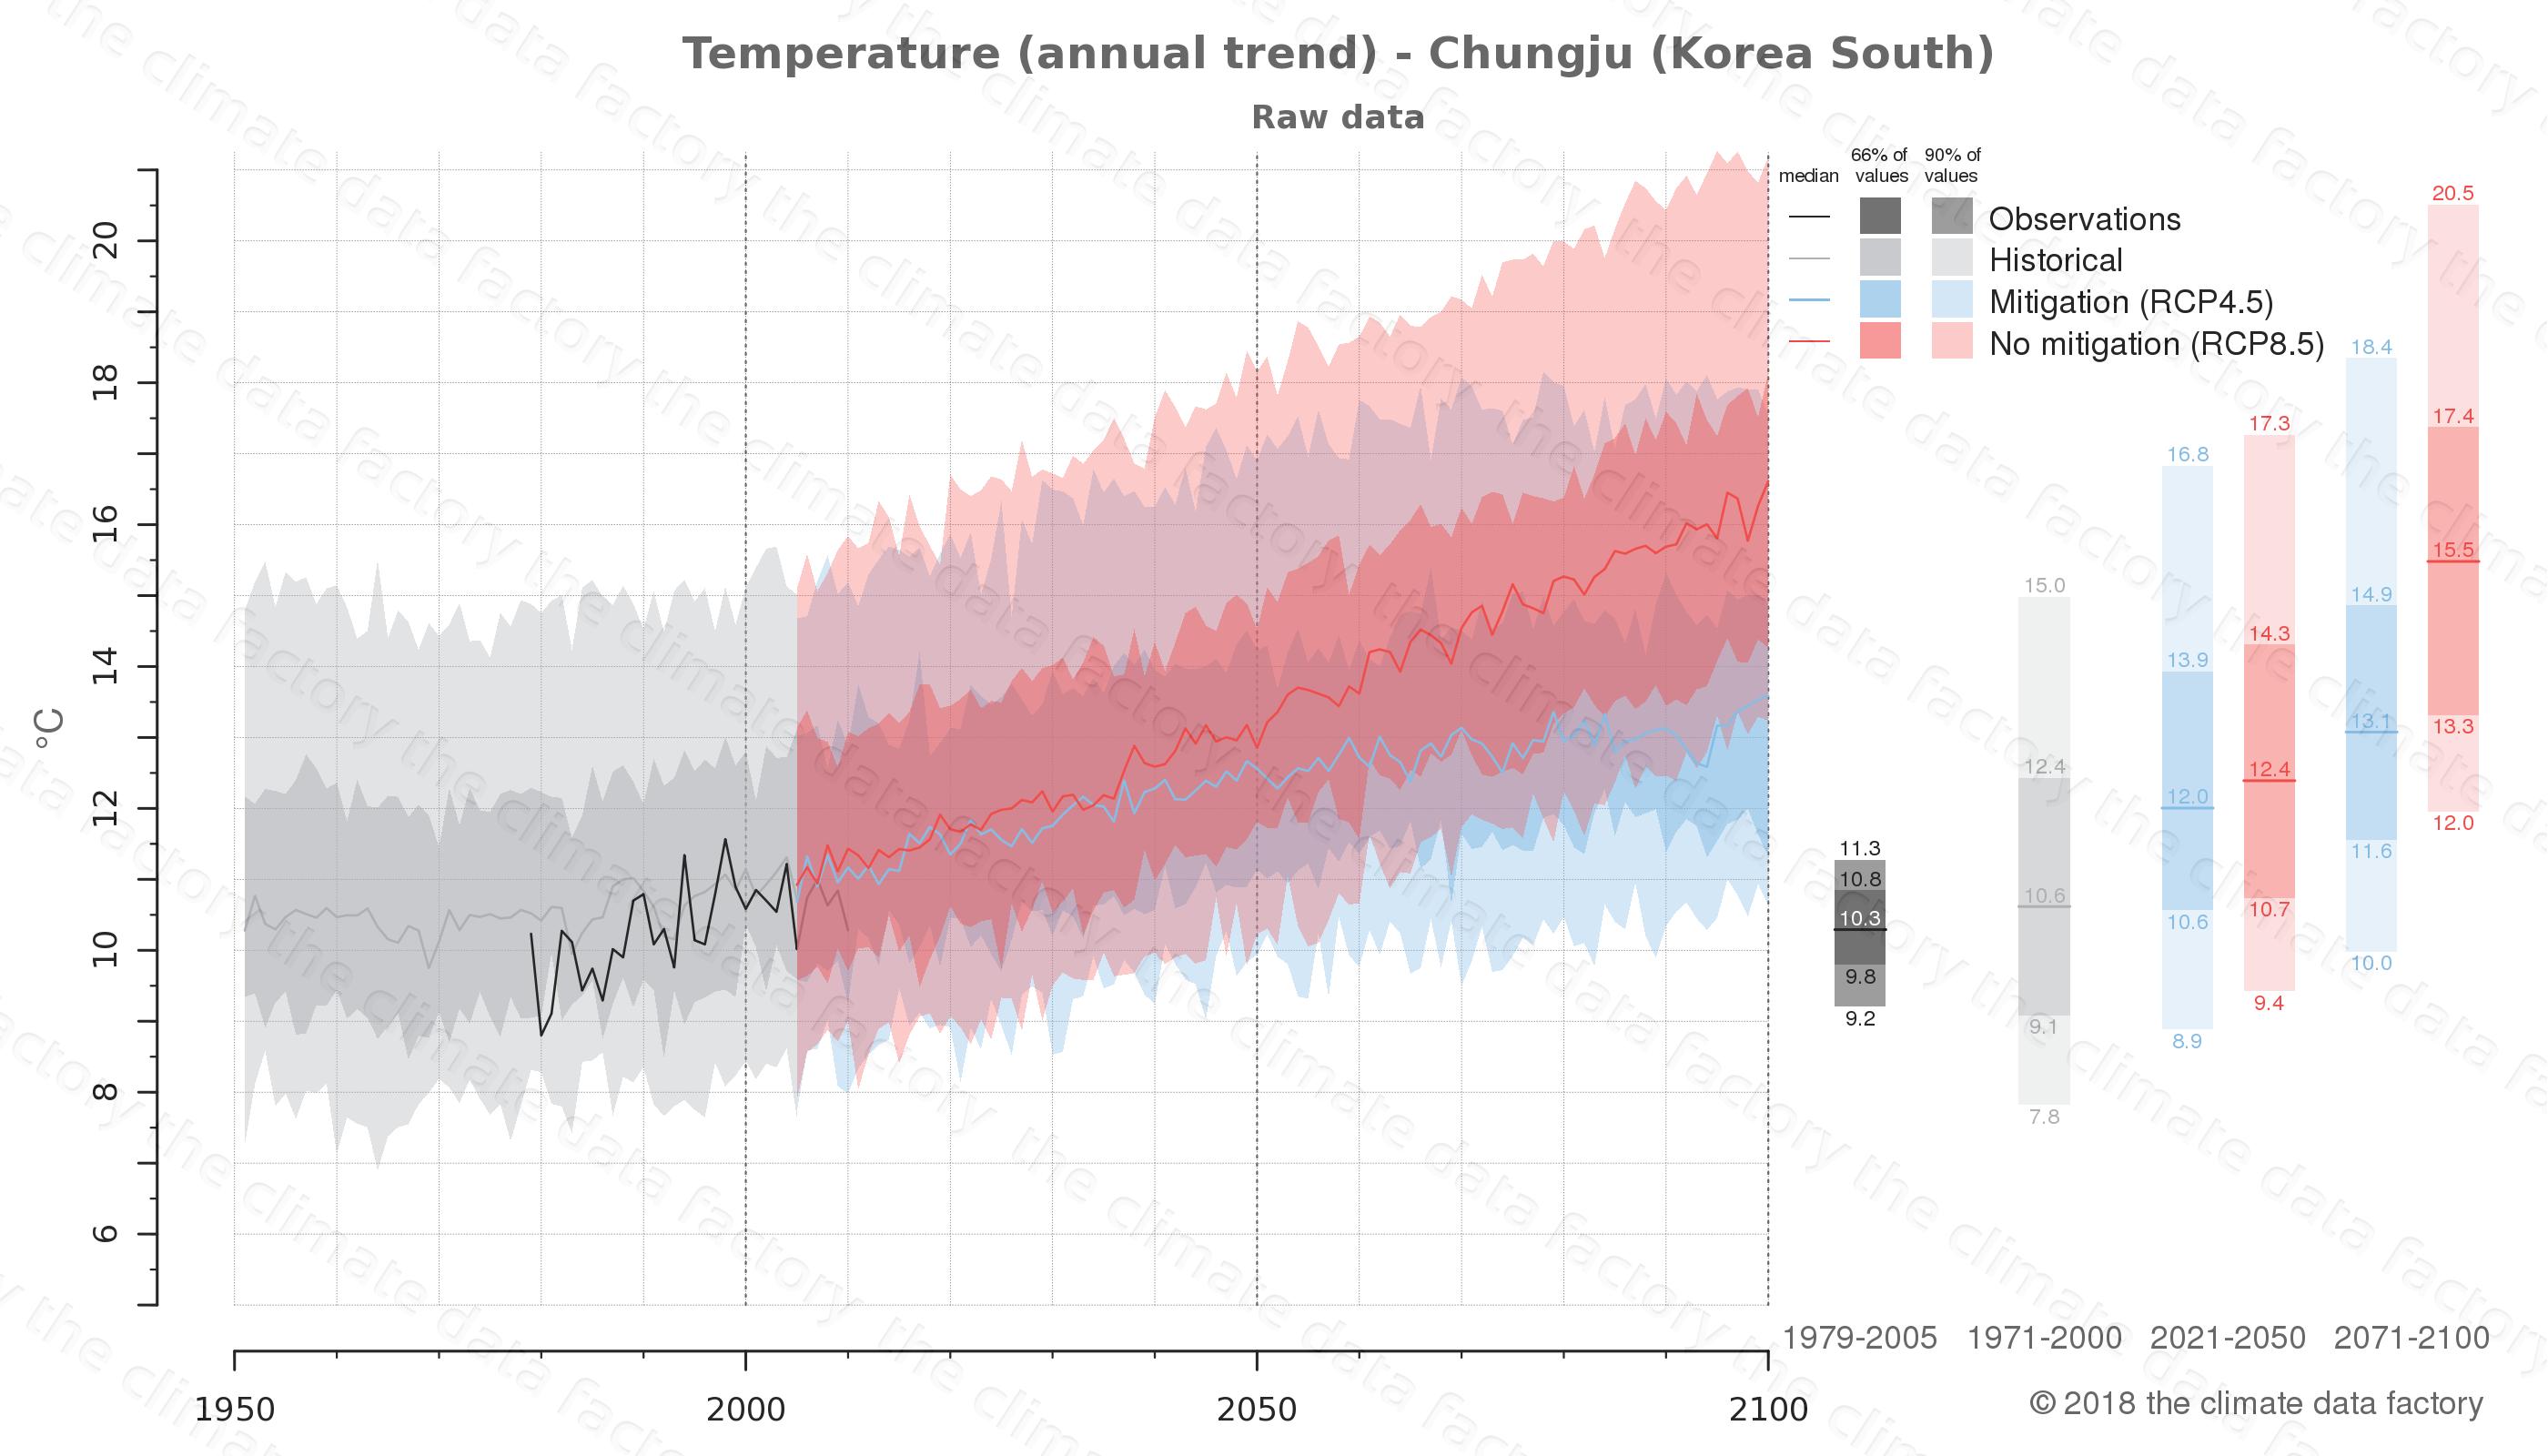 climate change data policy adaptation climate graph city data temperature chungju south korea